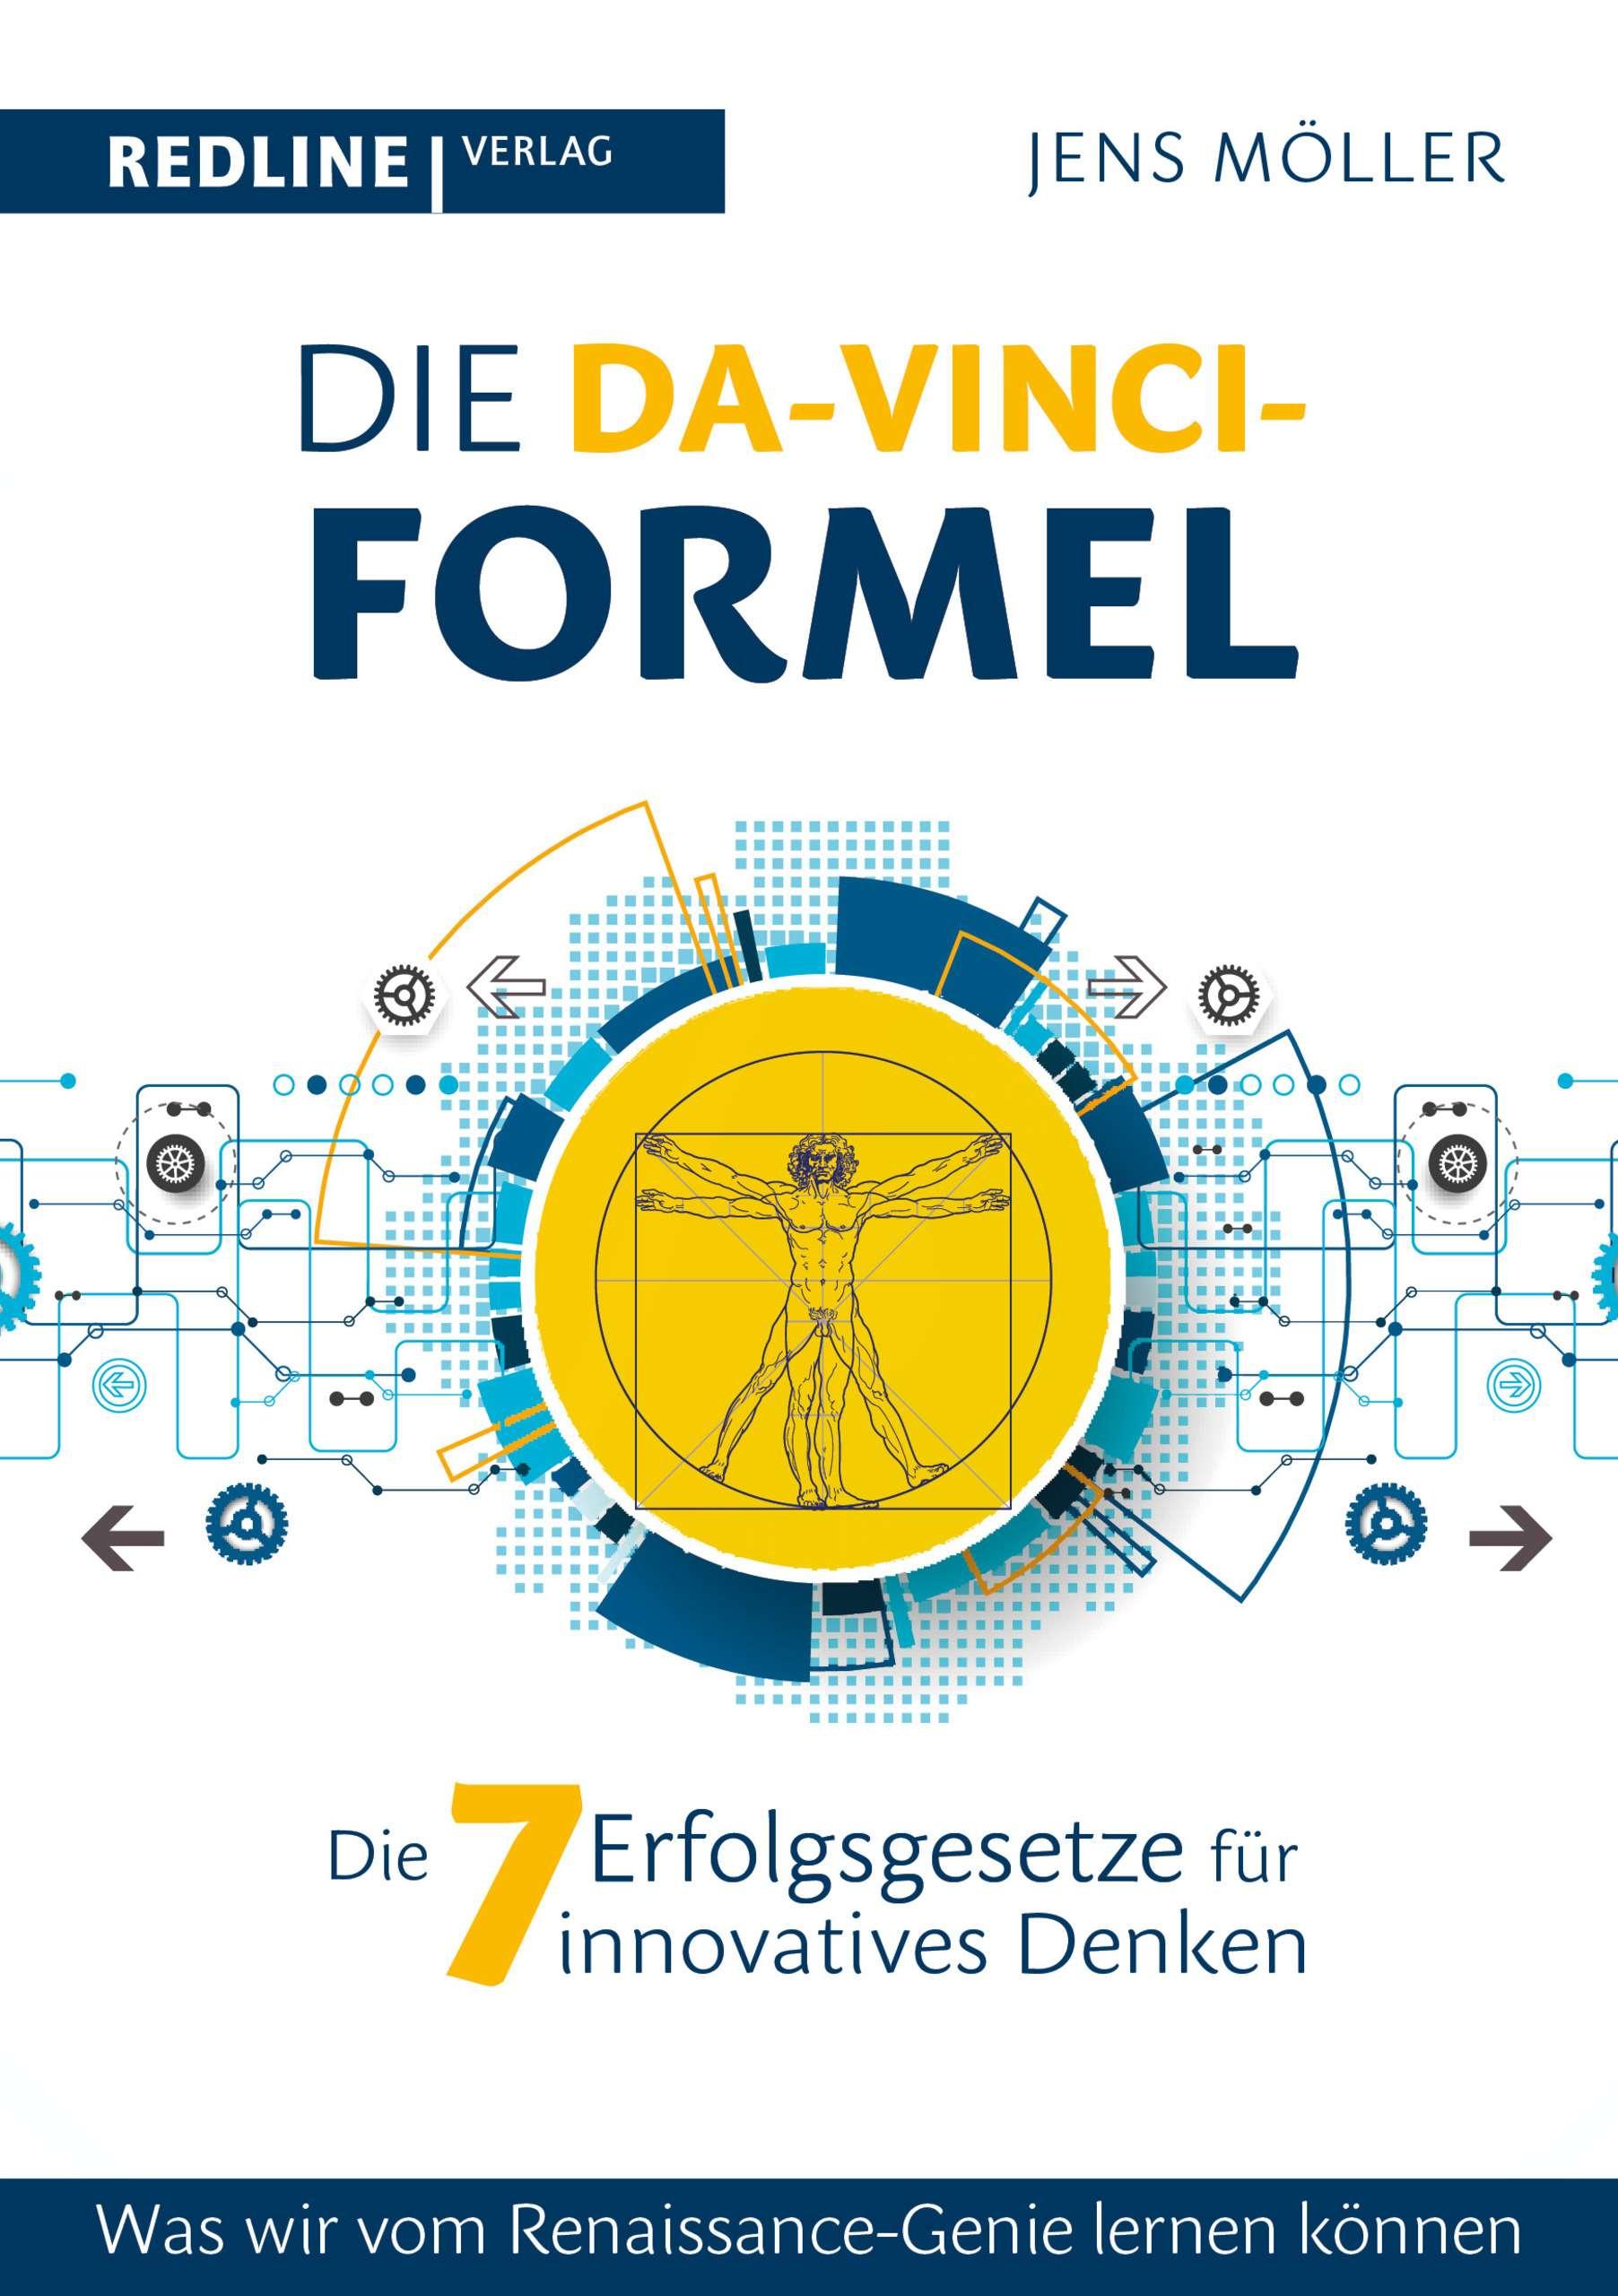 """Die Da-Vinci-Formel"" von Jens Möller © redline verlag Yogannetteblog.de"